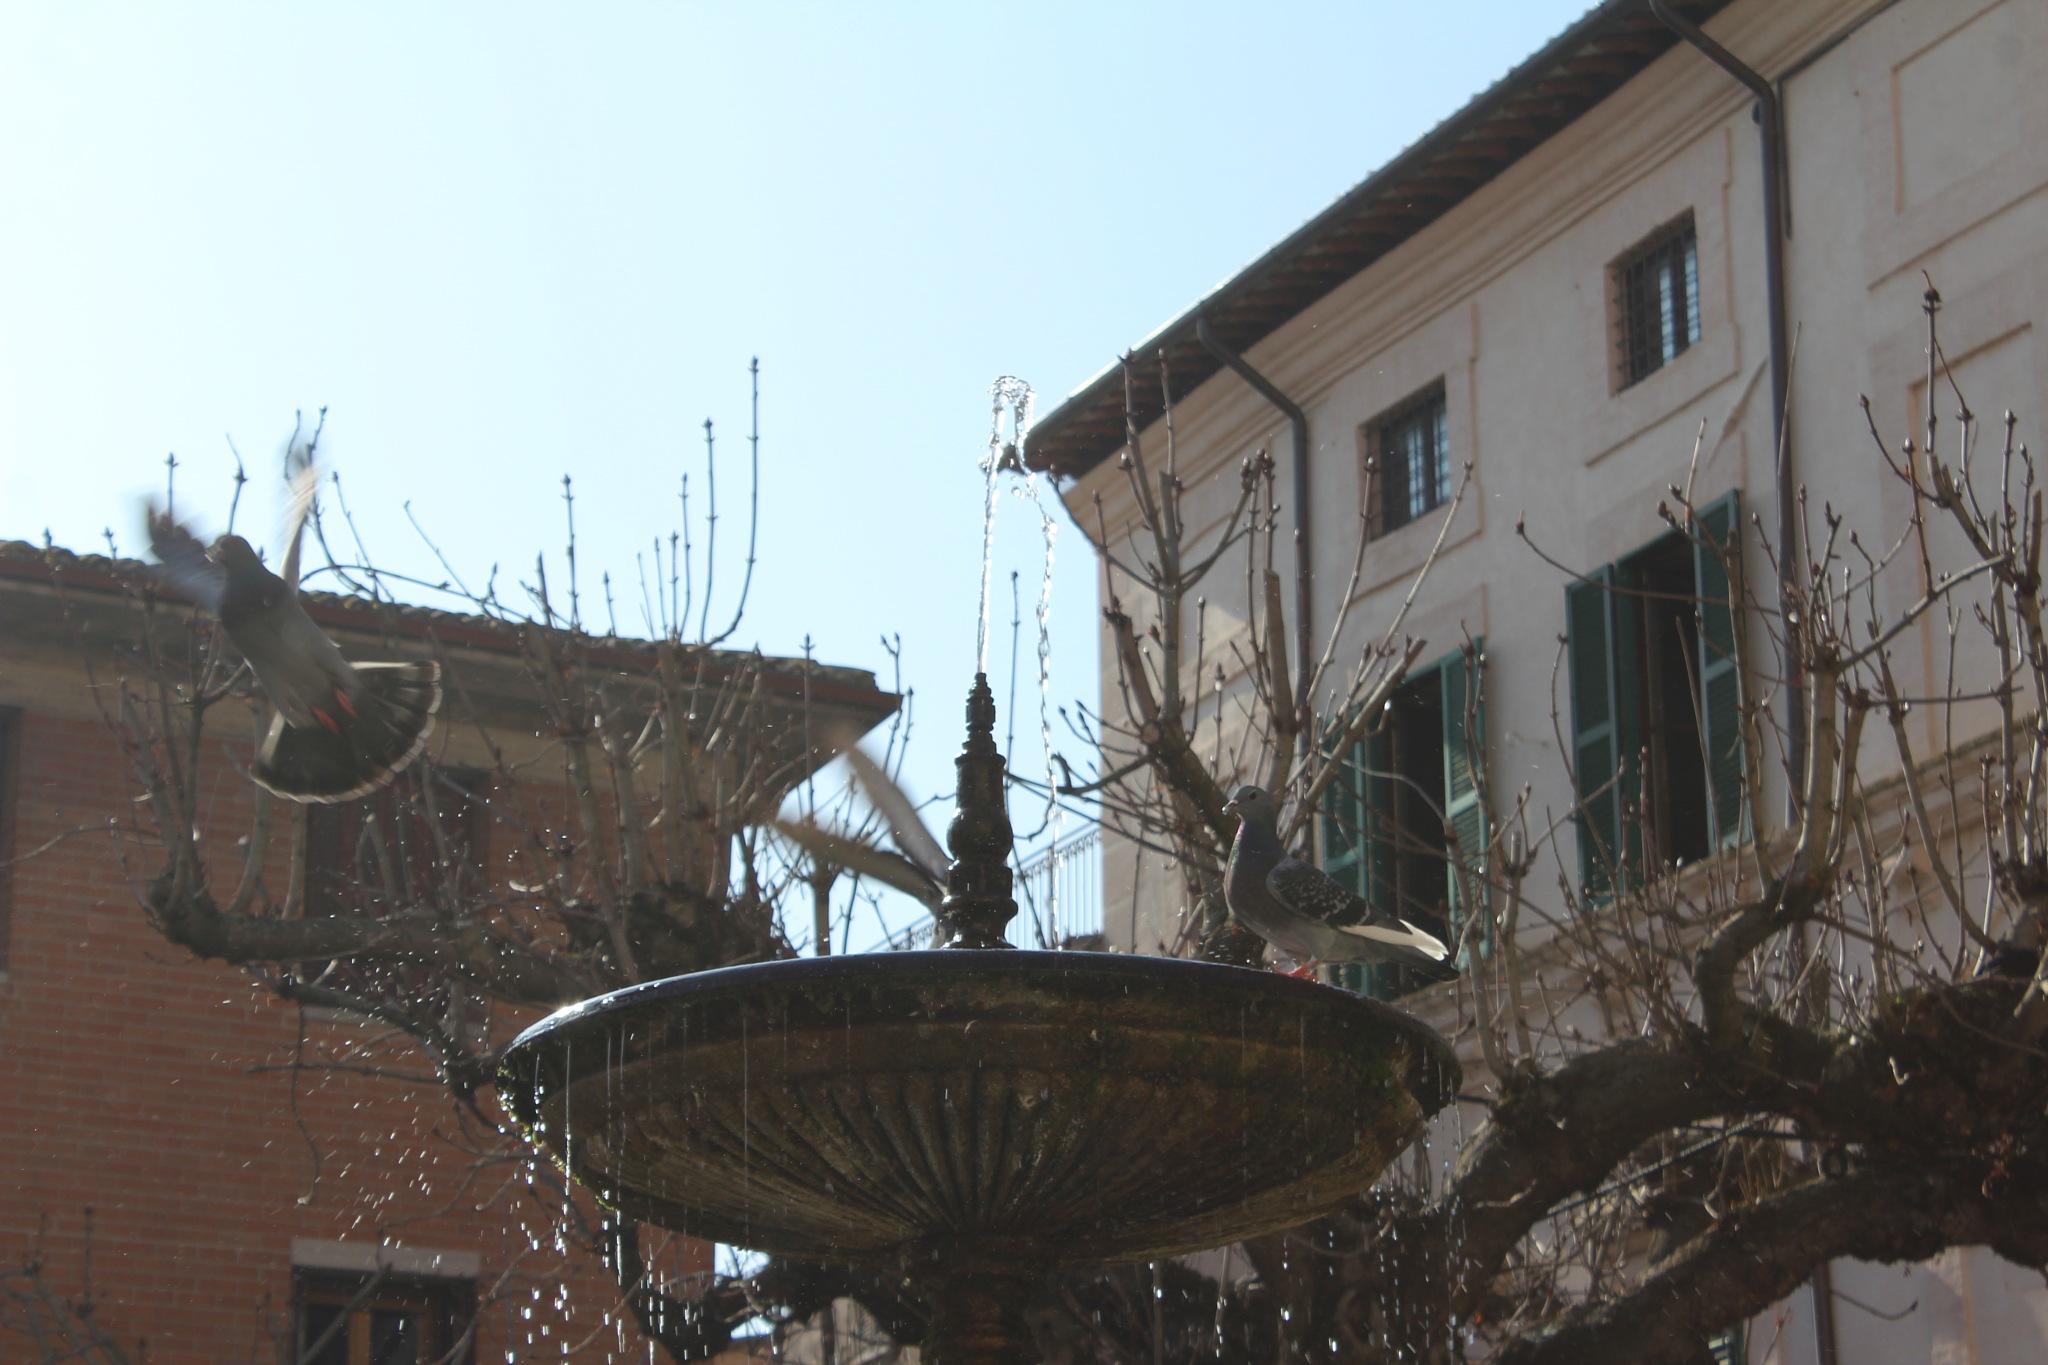 Spello, Umbria by Alberto Vivarelli